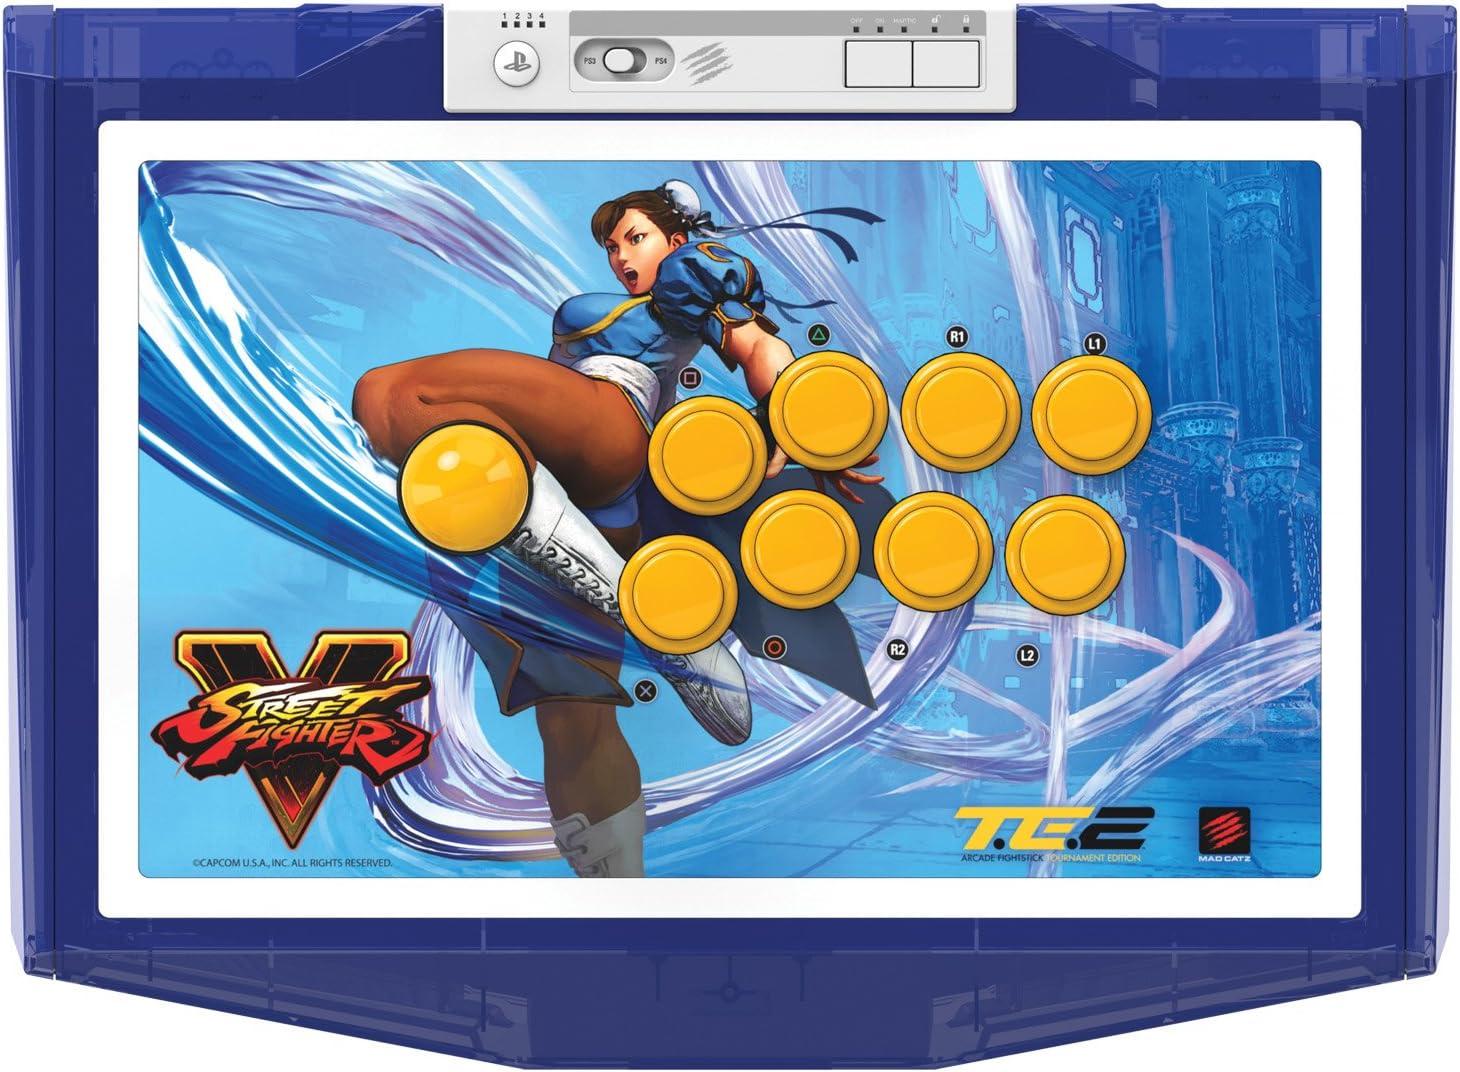 Amazon.com: Mad Catz Street Fighter V Chun-Li Arcade Fight Stick ...